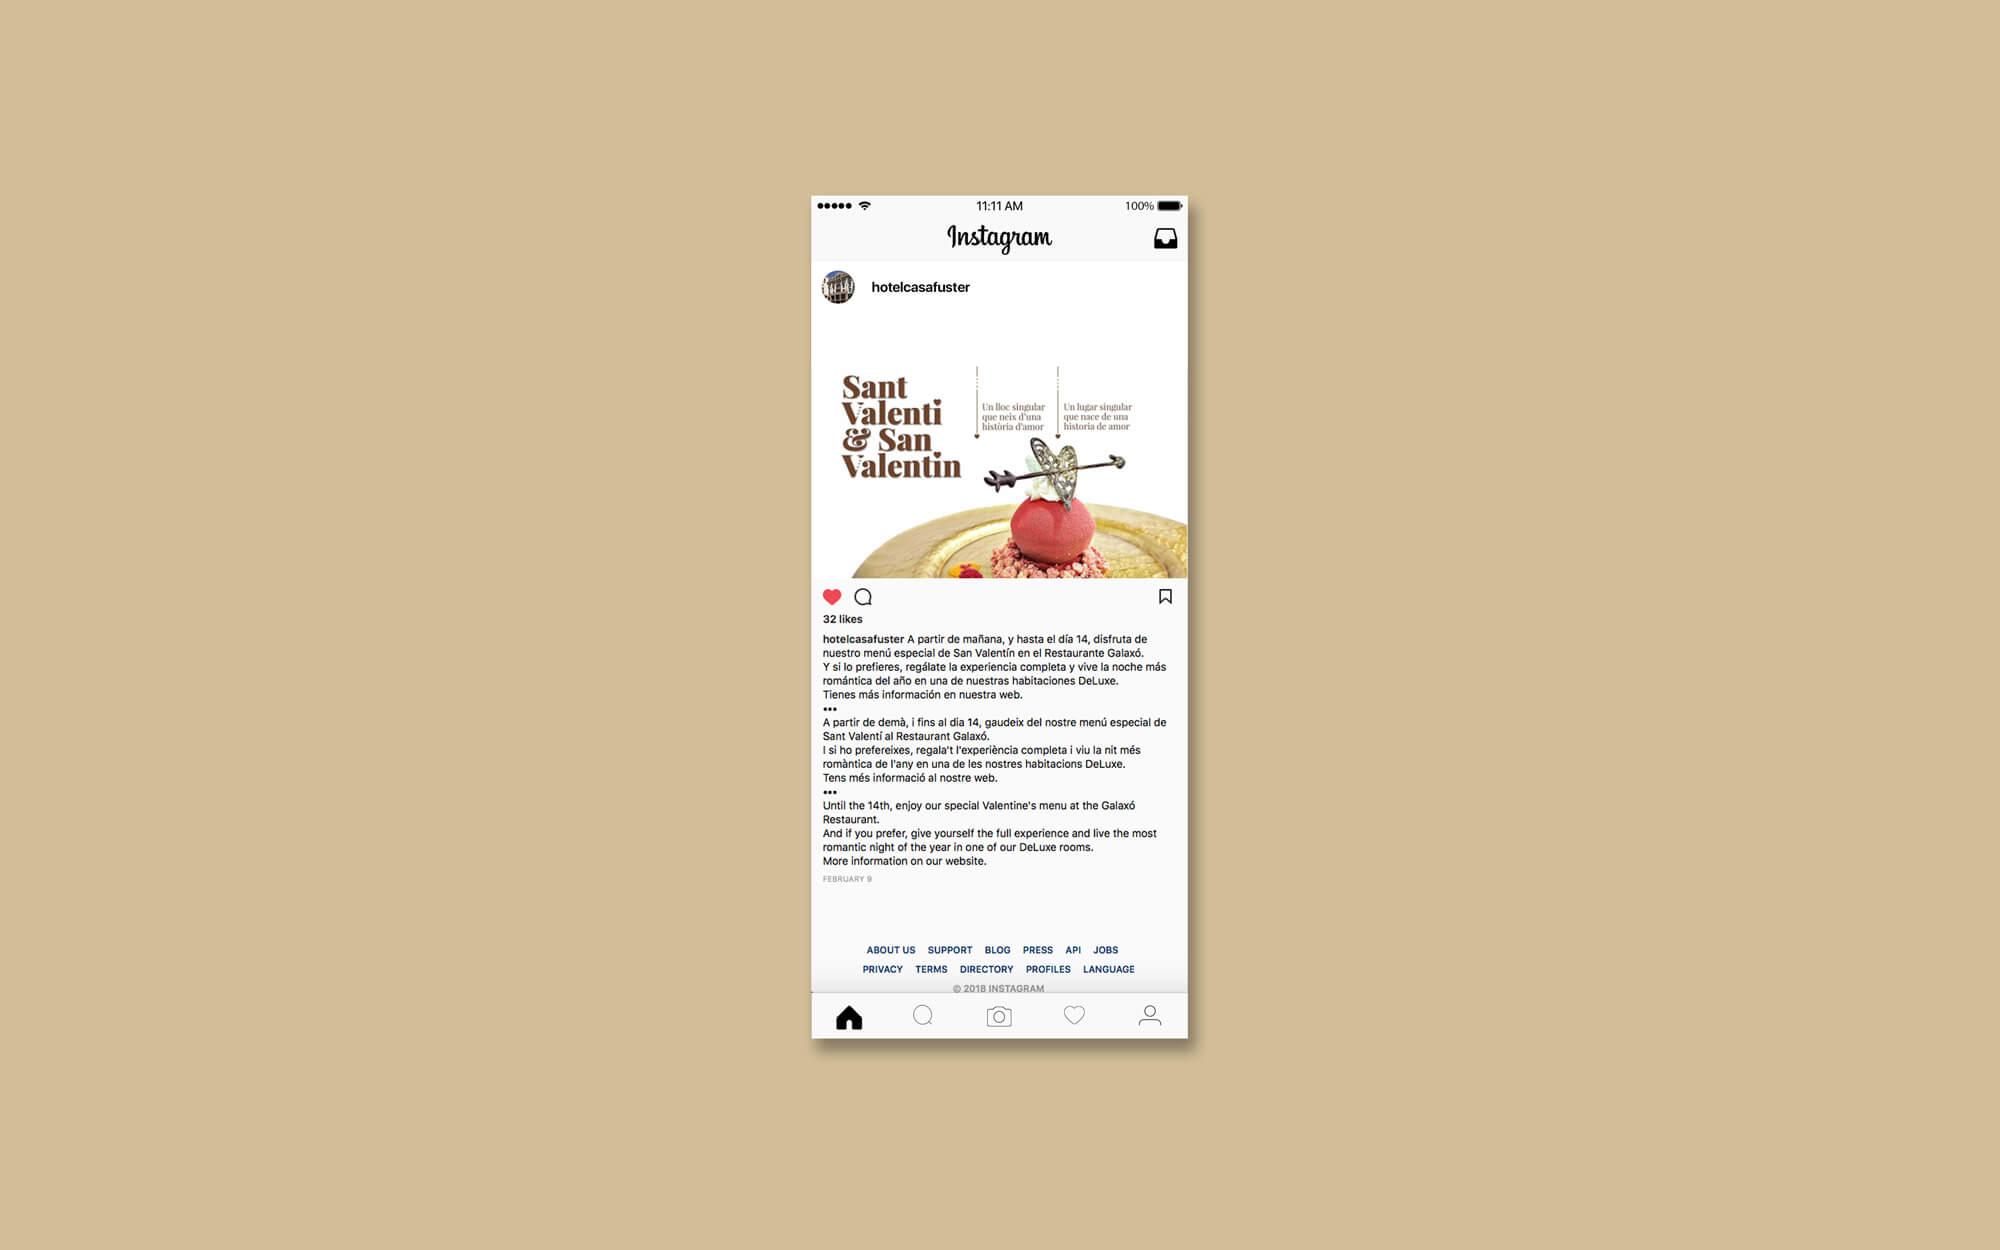 Hotel Casa Fuster, Hotel, Barcelona, Sant Valentí, Newsletter, la Negreta, Disseny Gràfic, Barri de Gràcia, Digital, Comunicació, Mailchimp, Instagram